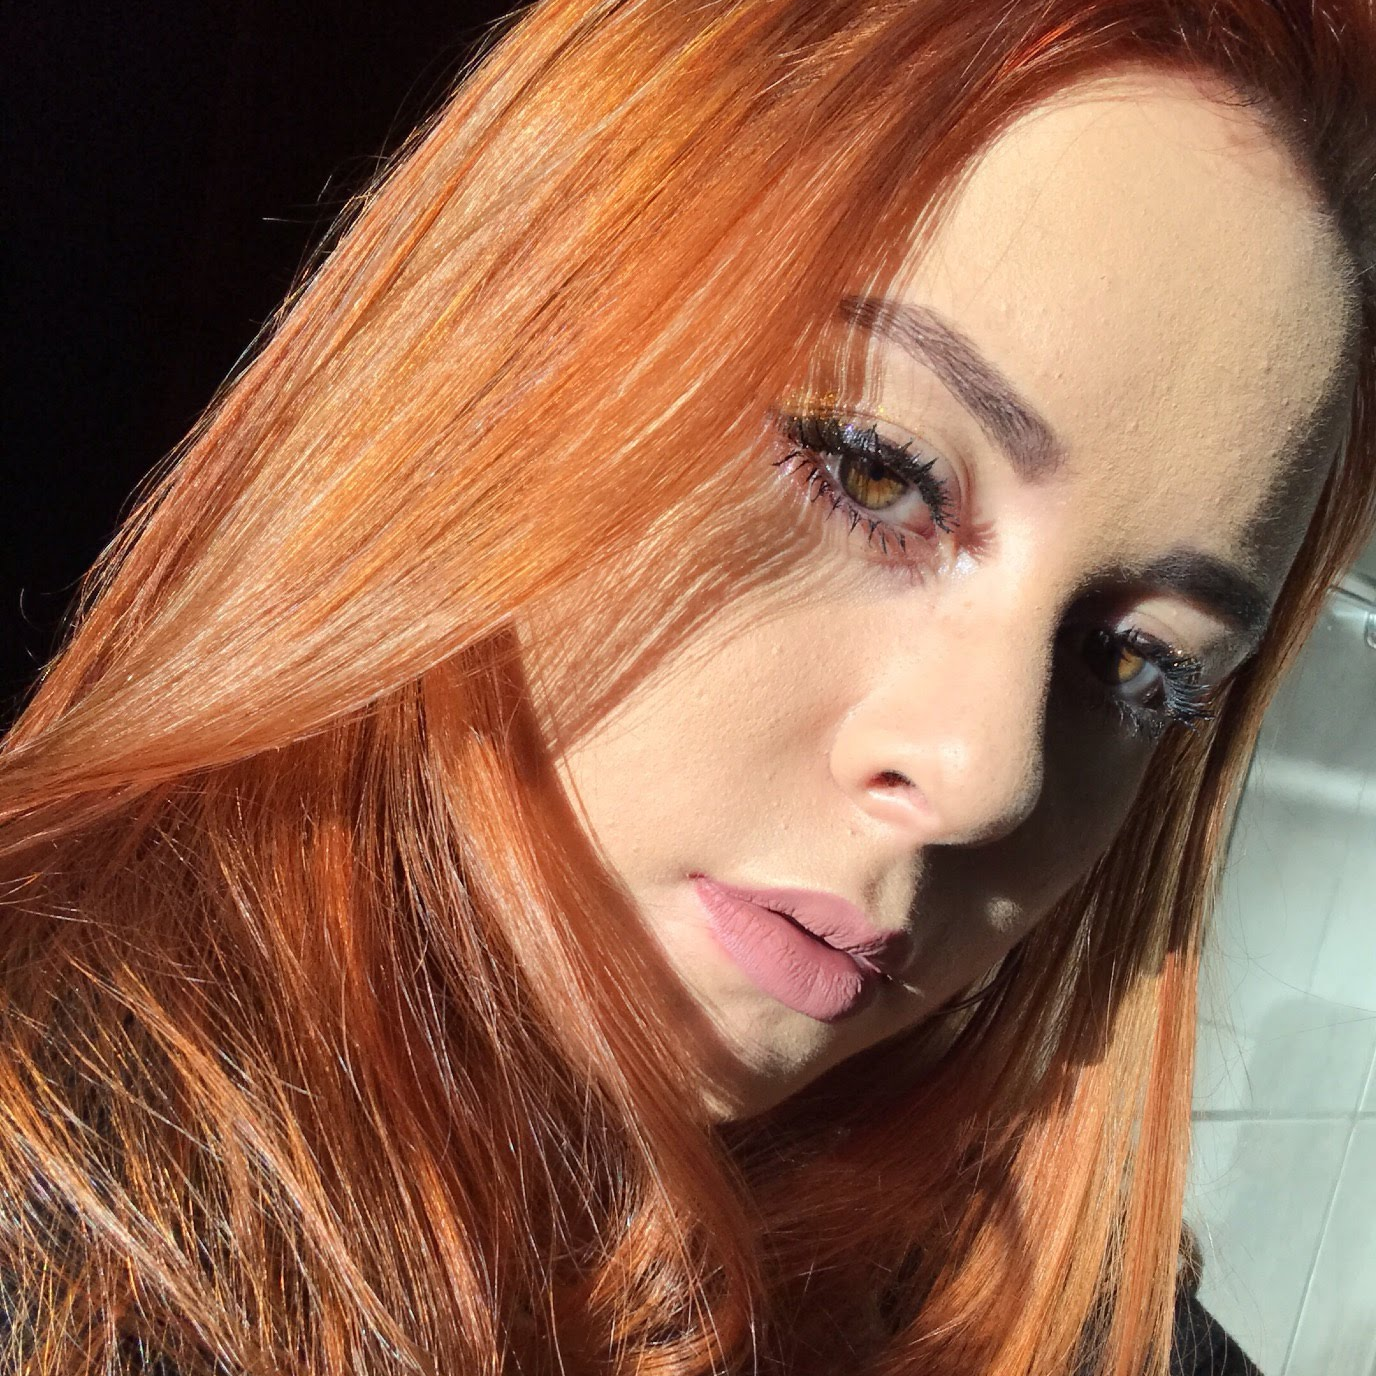 Giovanna Dos Santos